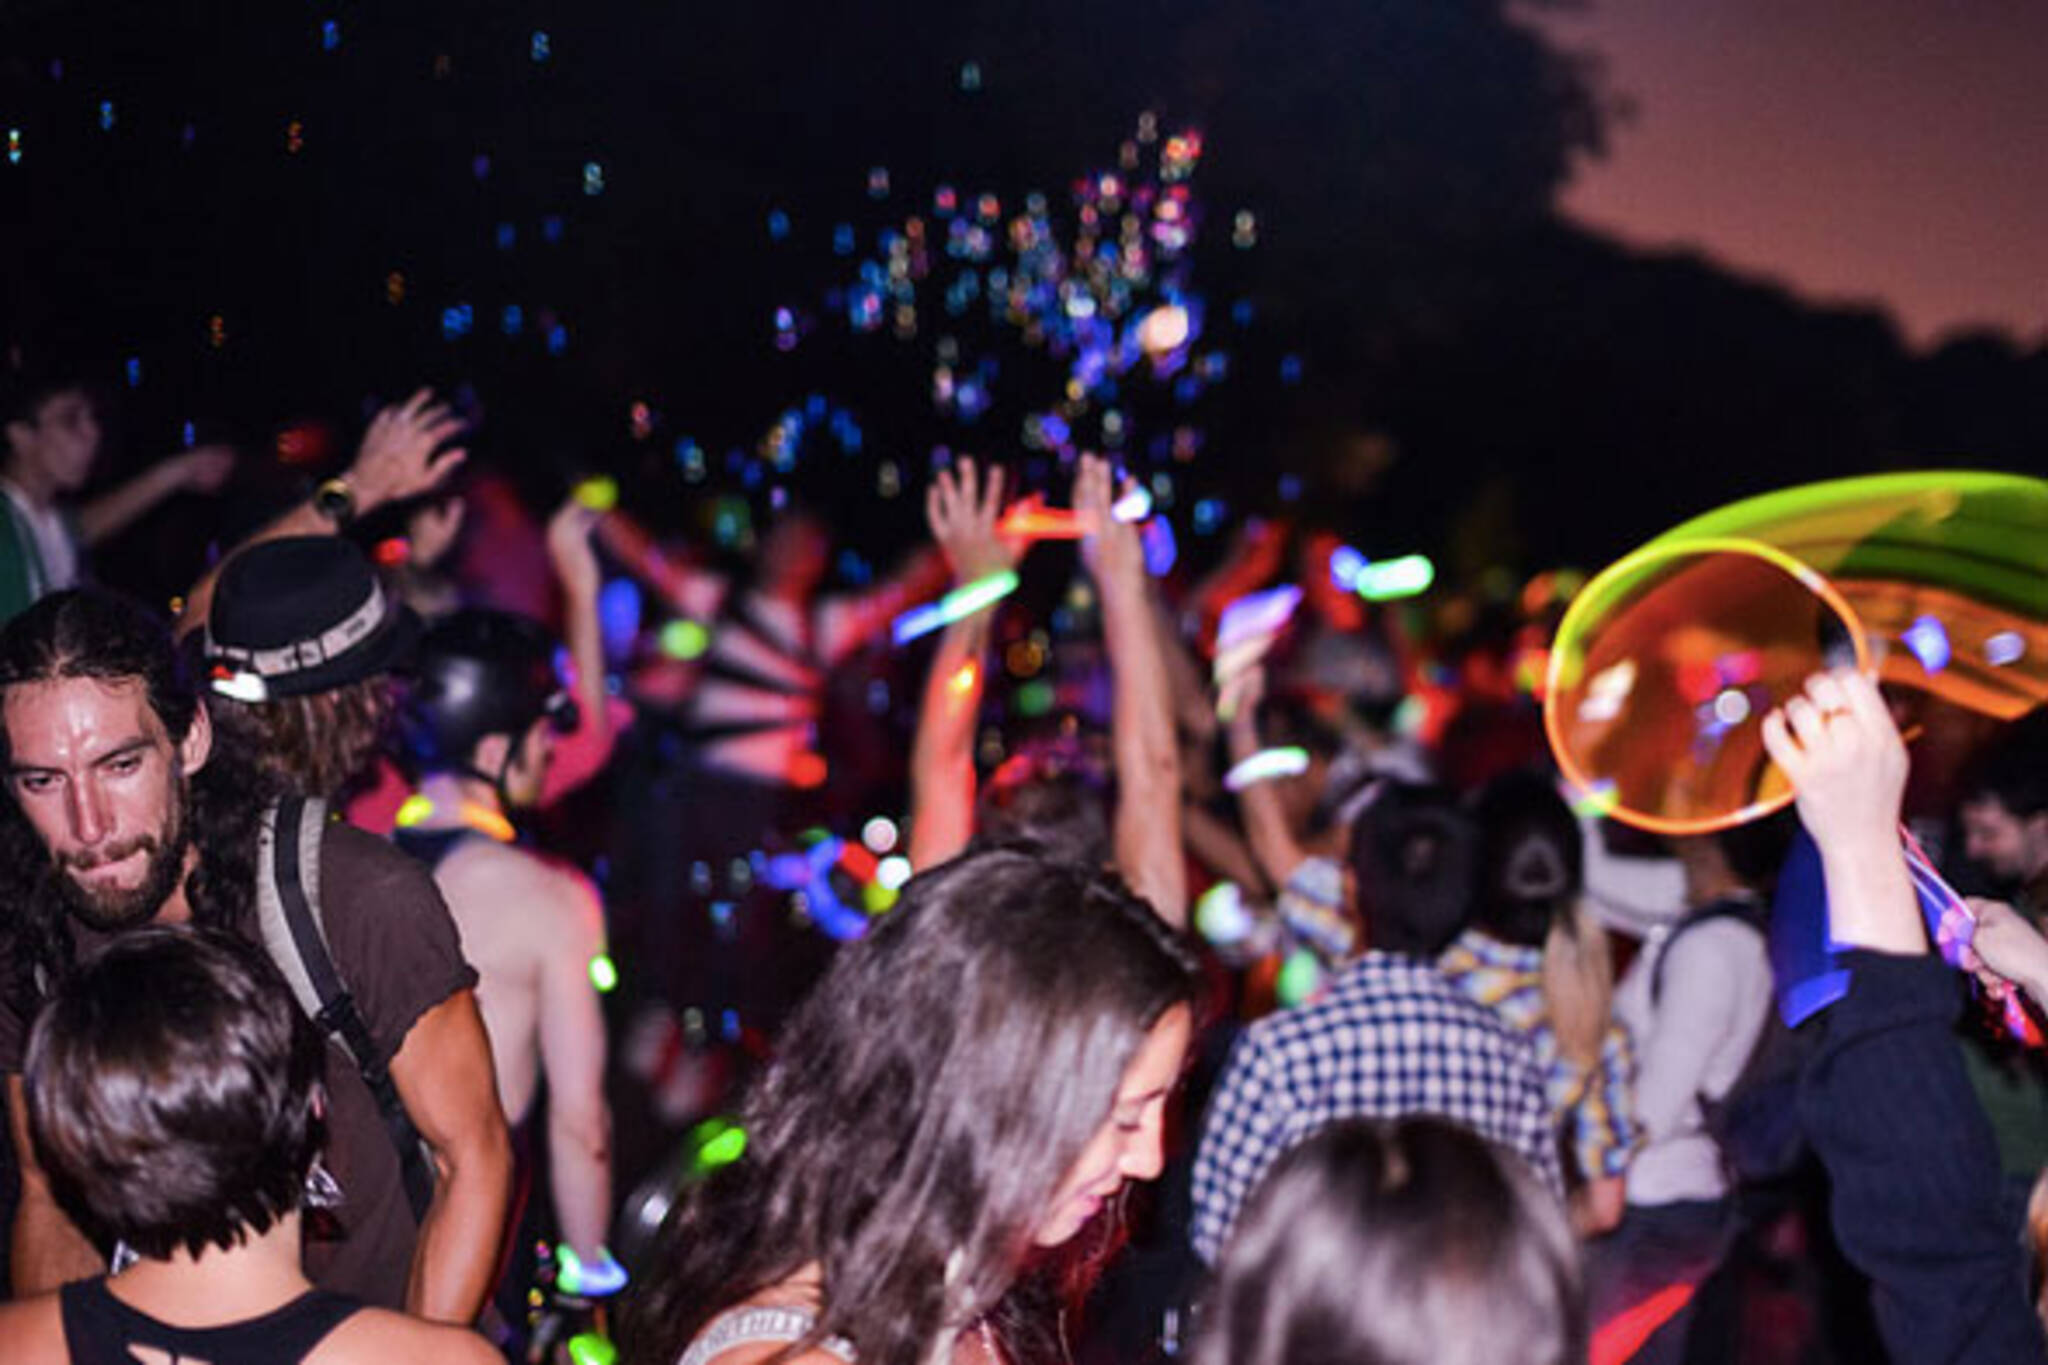 toronto events august 22